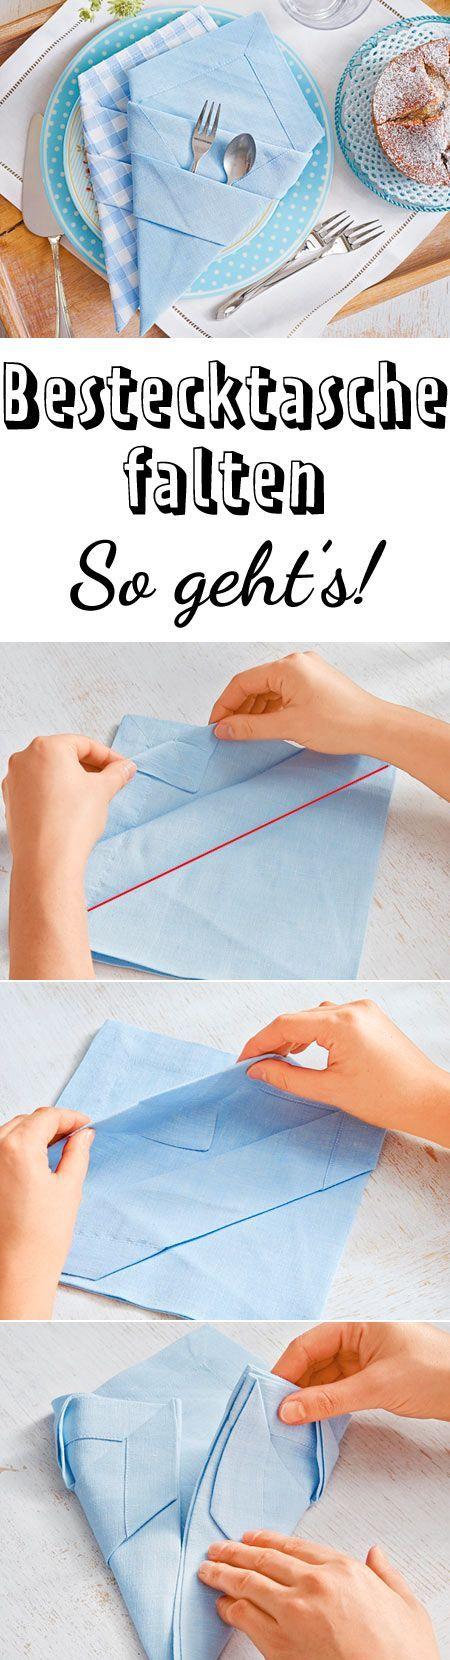 215 besten origami faltkunst bilder auf pinterest. Black Bedroom Furniture Sets. Home Design Ideas